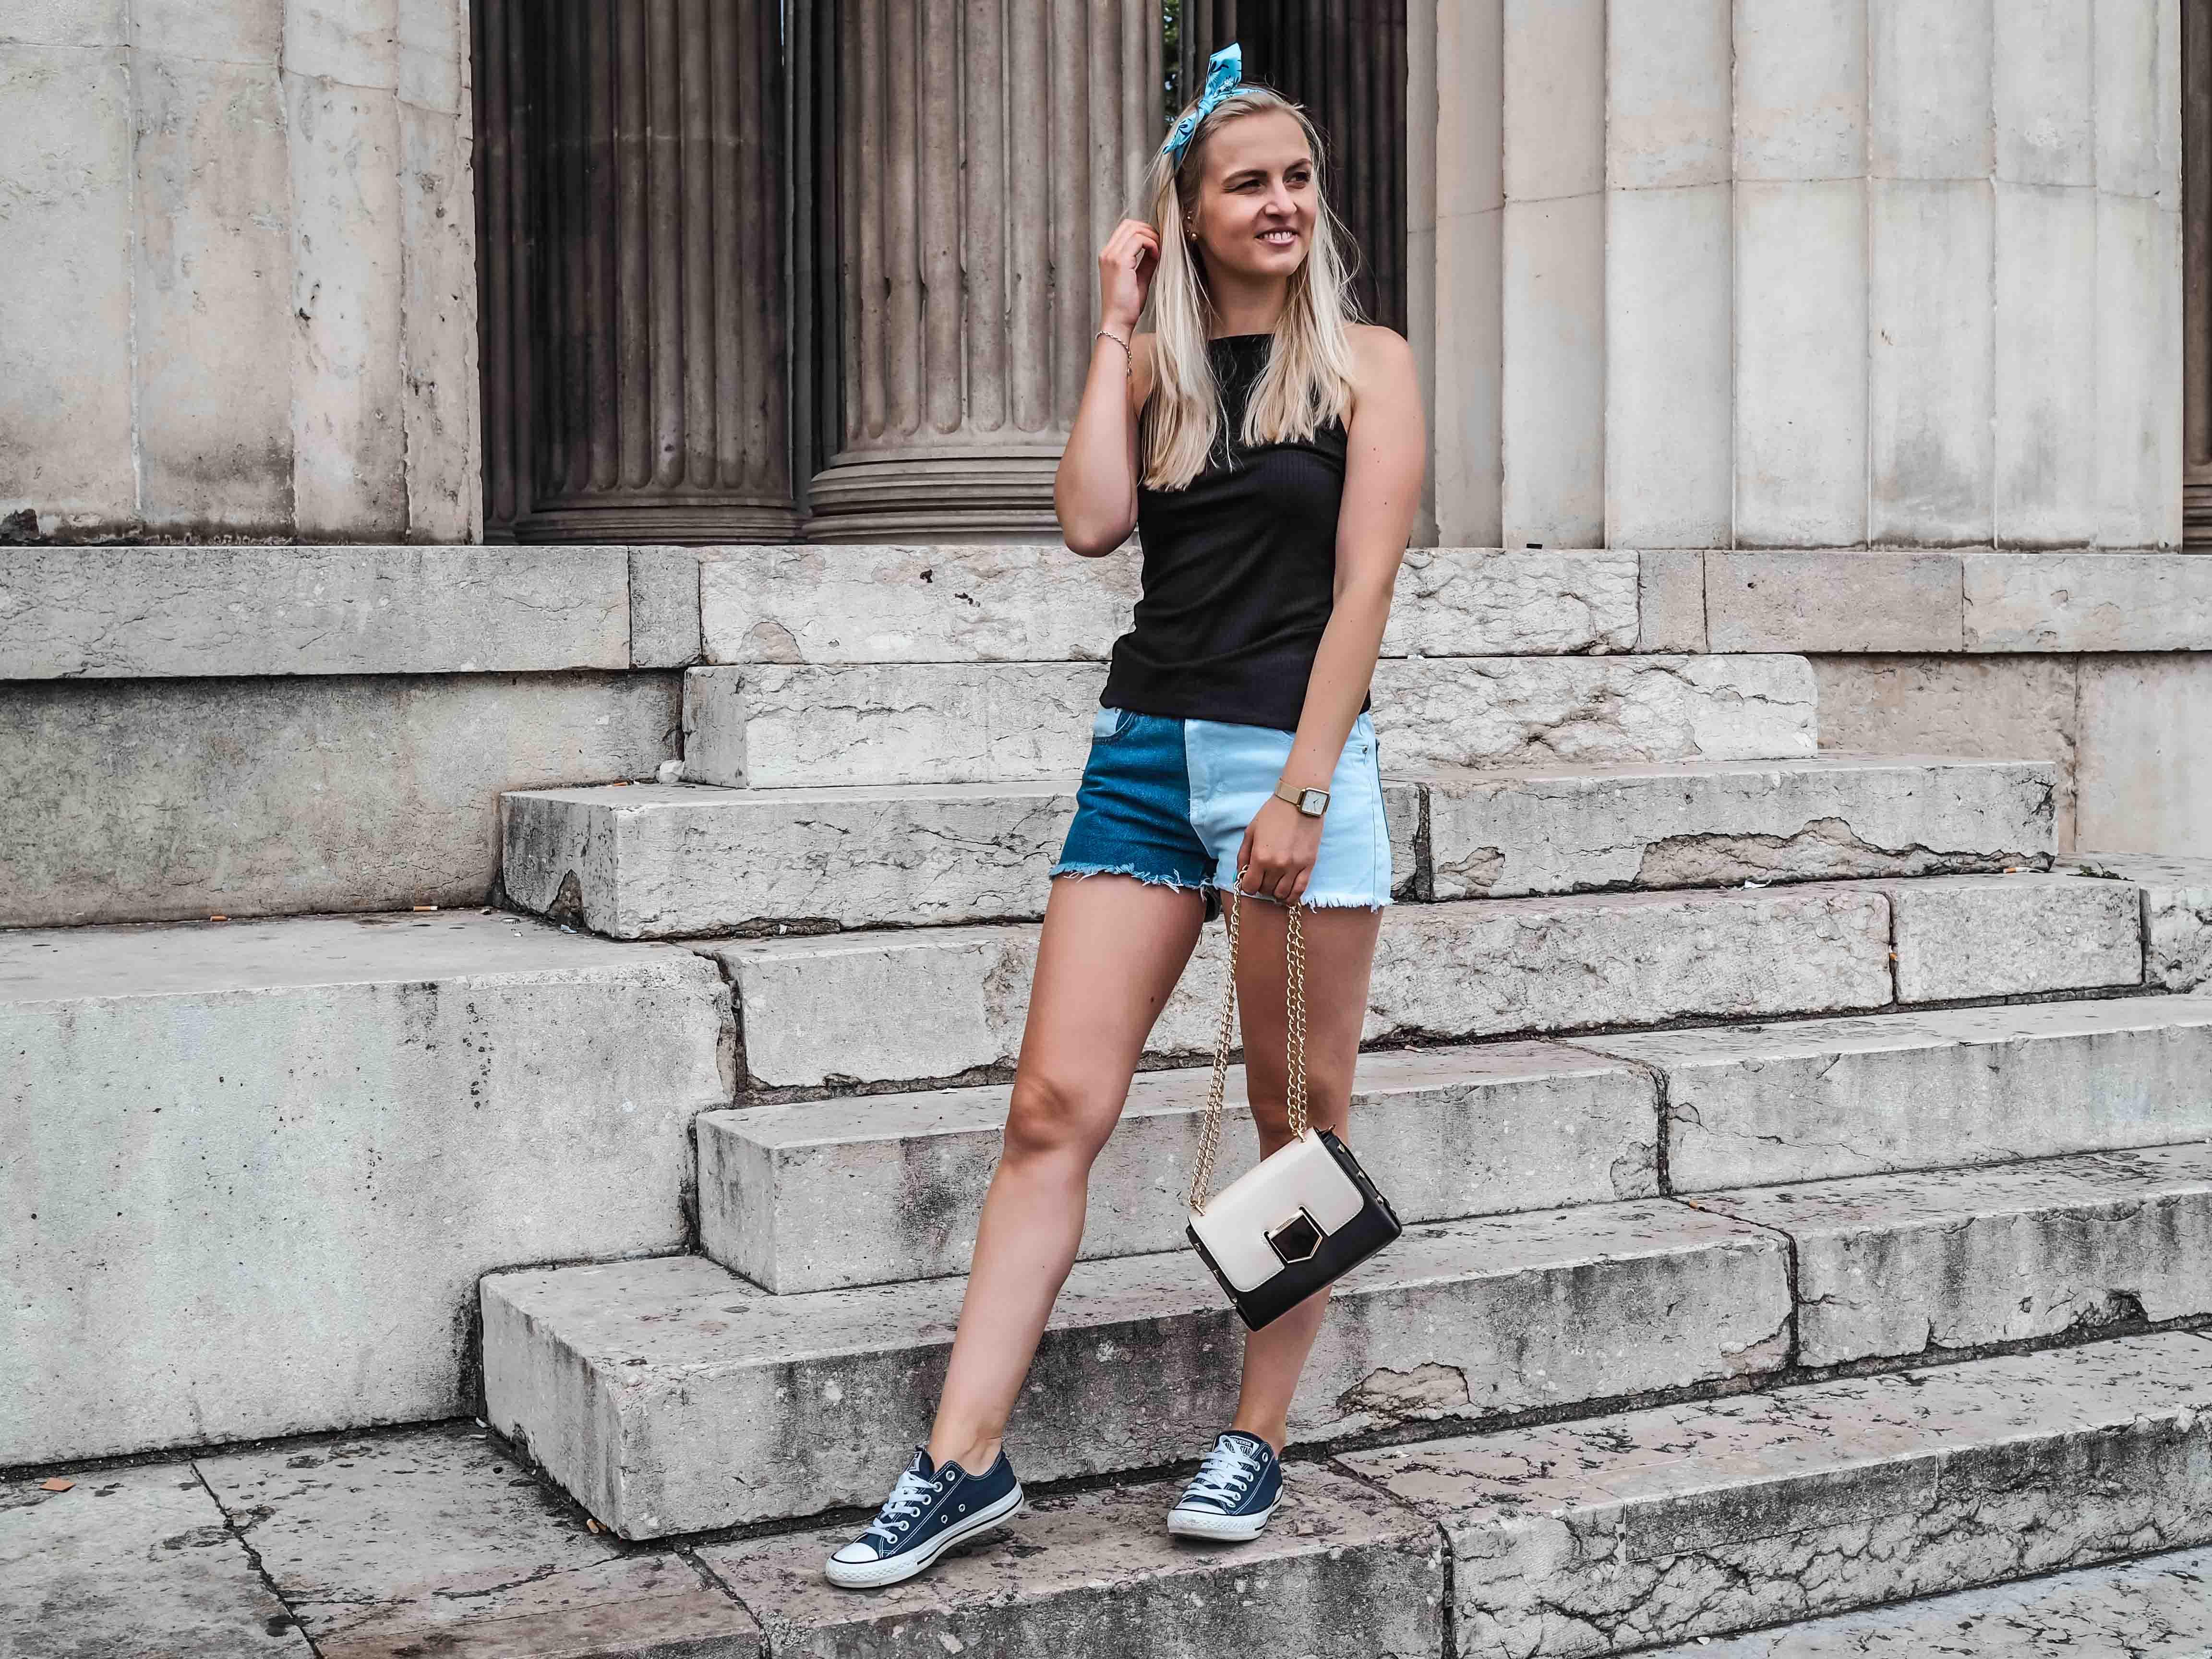 Bandana, Kopftuch, Kopfschmuck, Katefully, Fashionblog, Modeblog, München, ootd, Outfitinspiration, Fashionszene